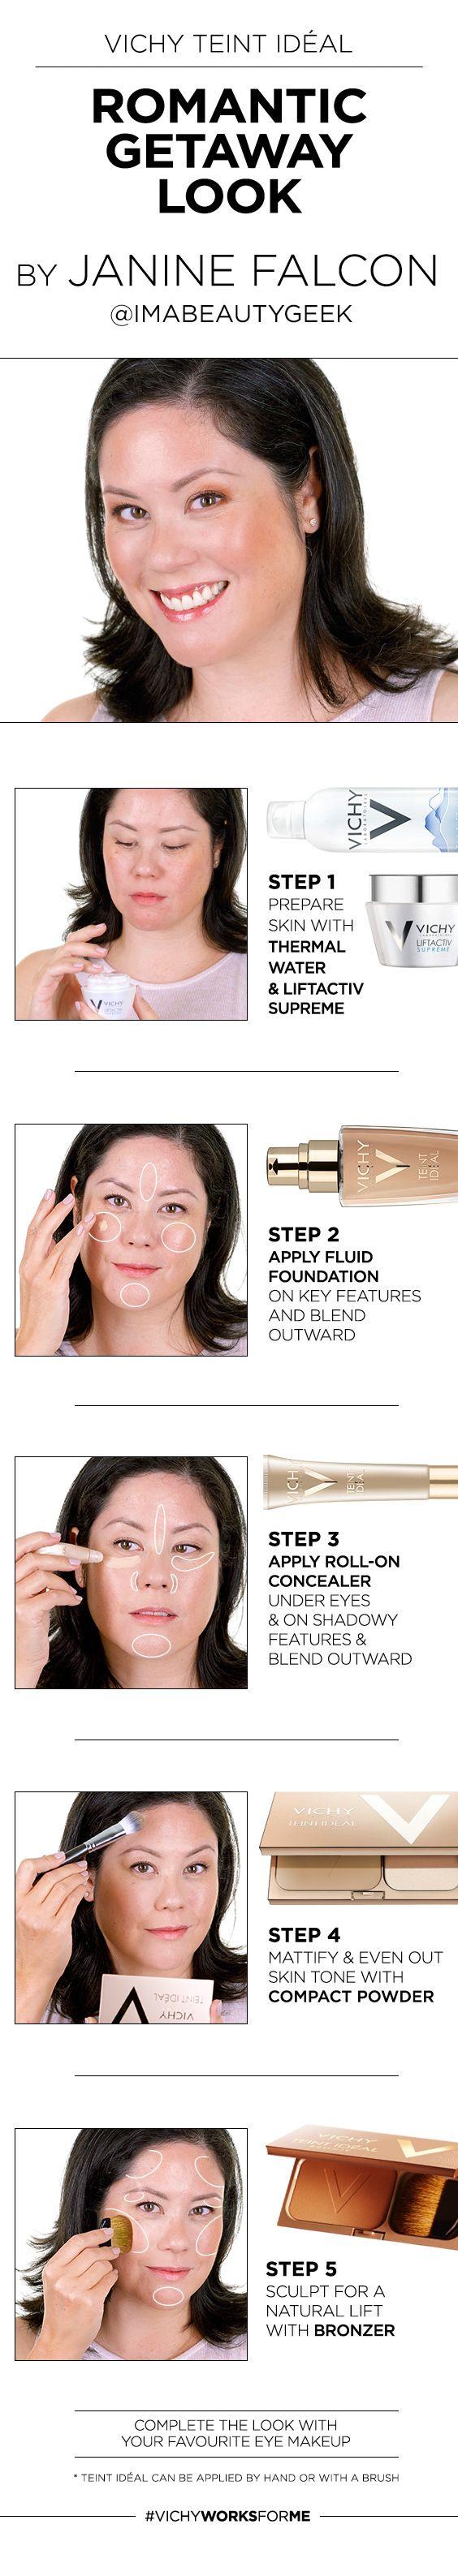 Find your Teint Idéal : http://www.vichy.ca/en/makeup-teint-ideal-info